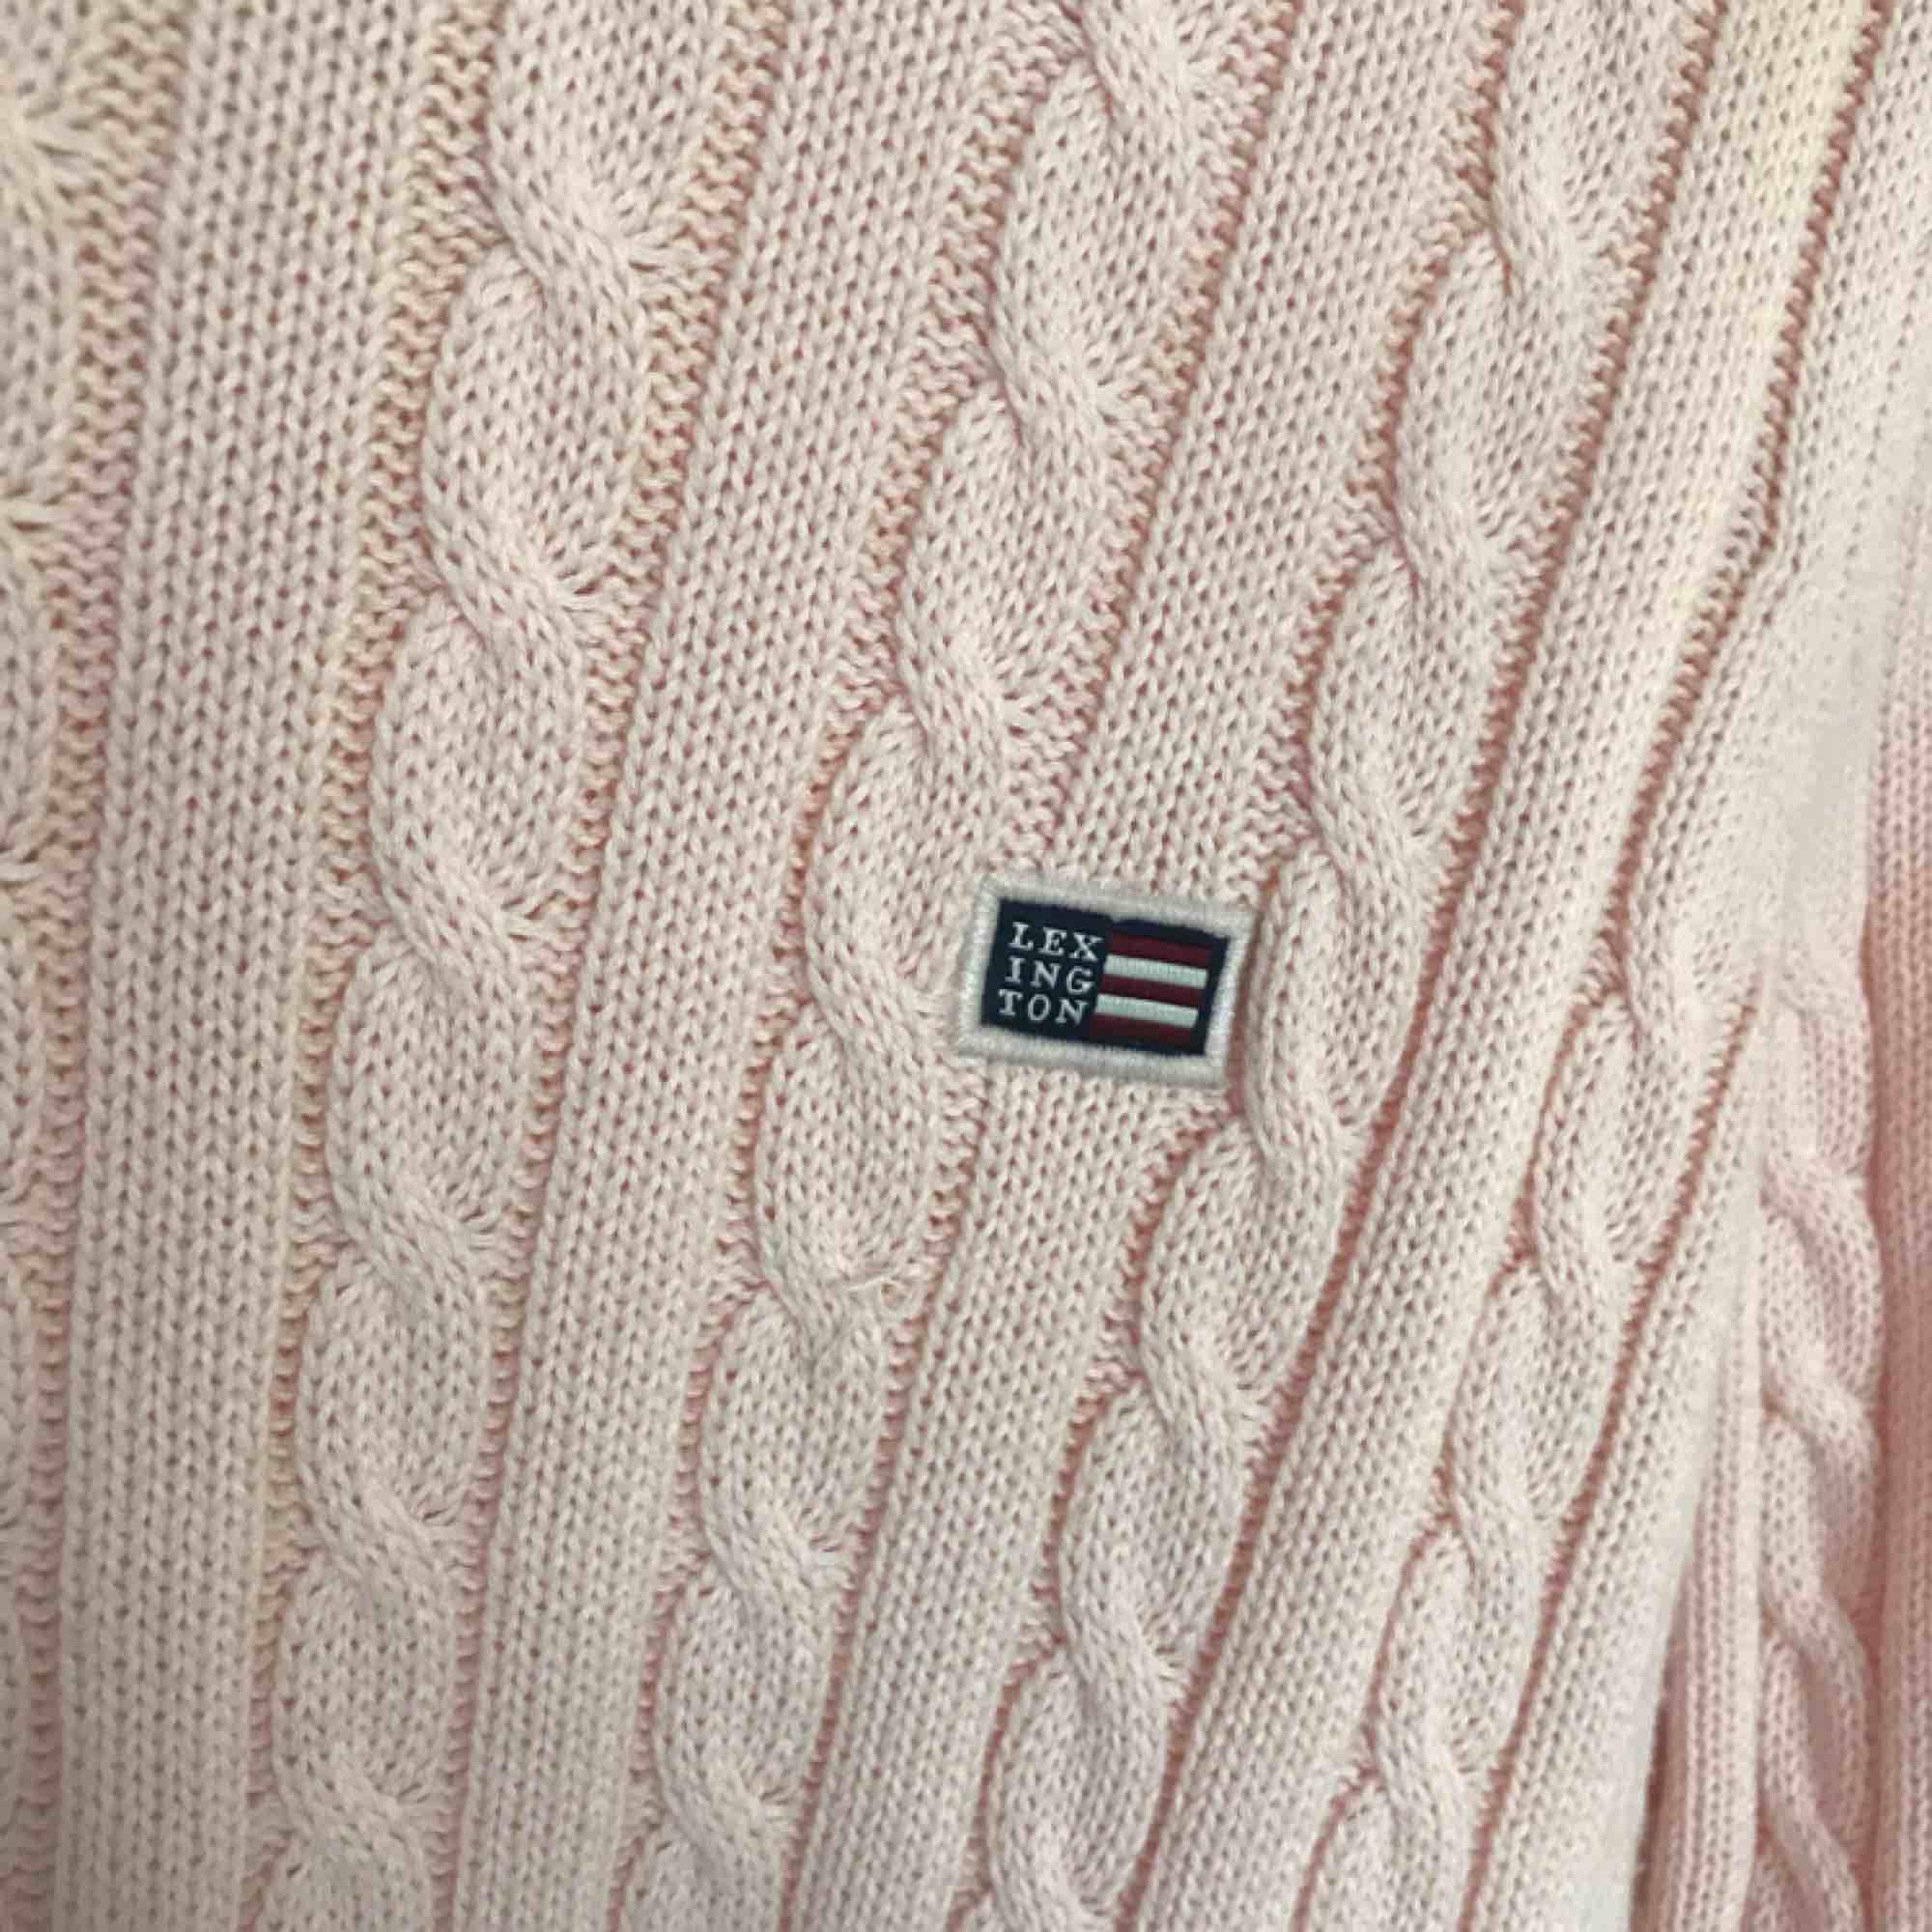 Stickad ljusrosa Lexington tröja Använd max 10 gånger Ordinarie pris 1199kr. Stickat.